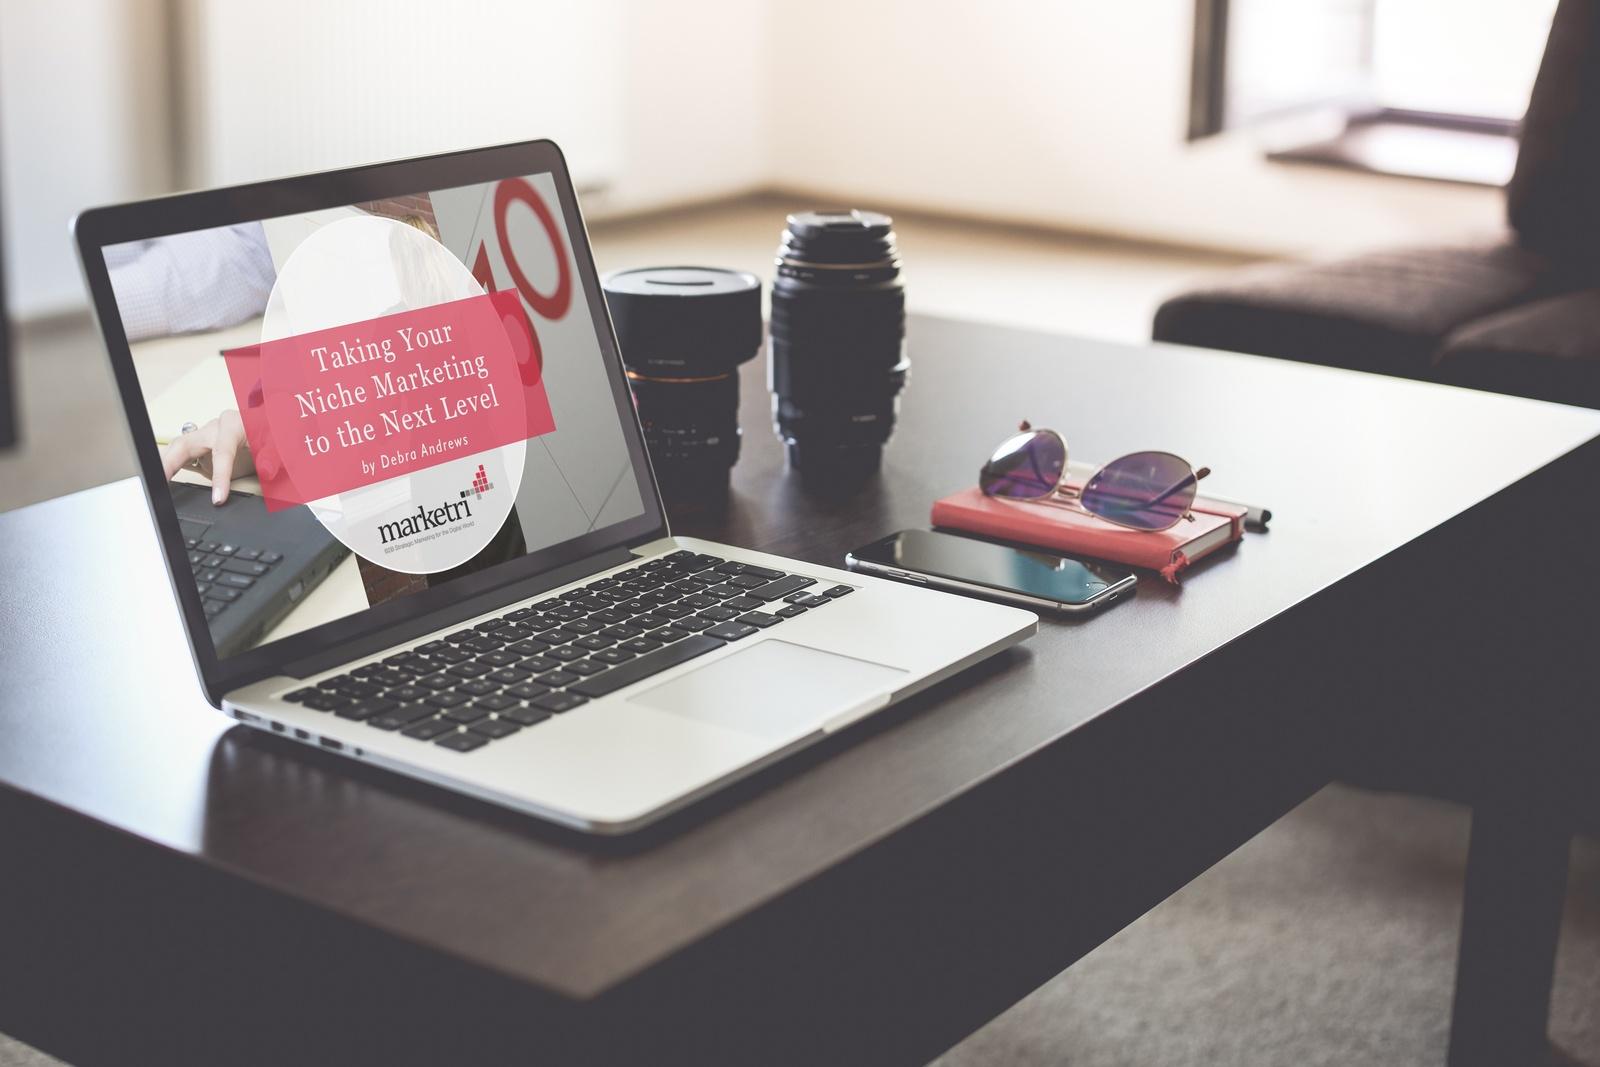 Marketri-Niche-Marketing-Webinar2